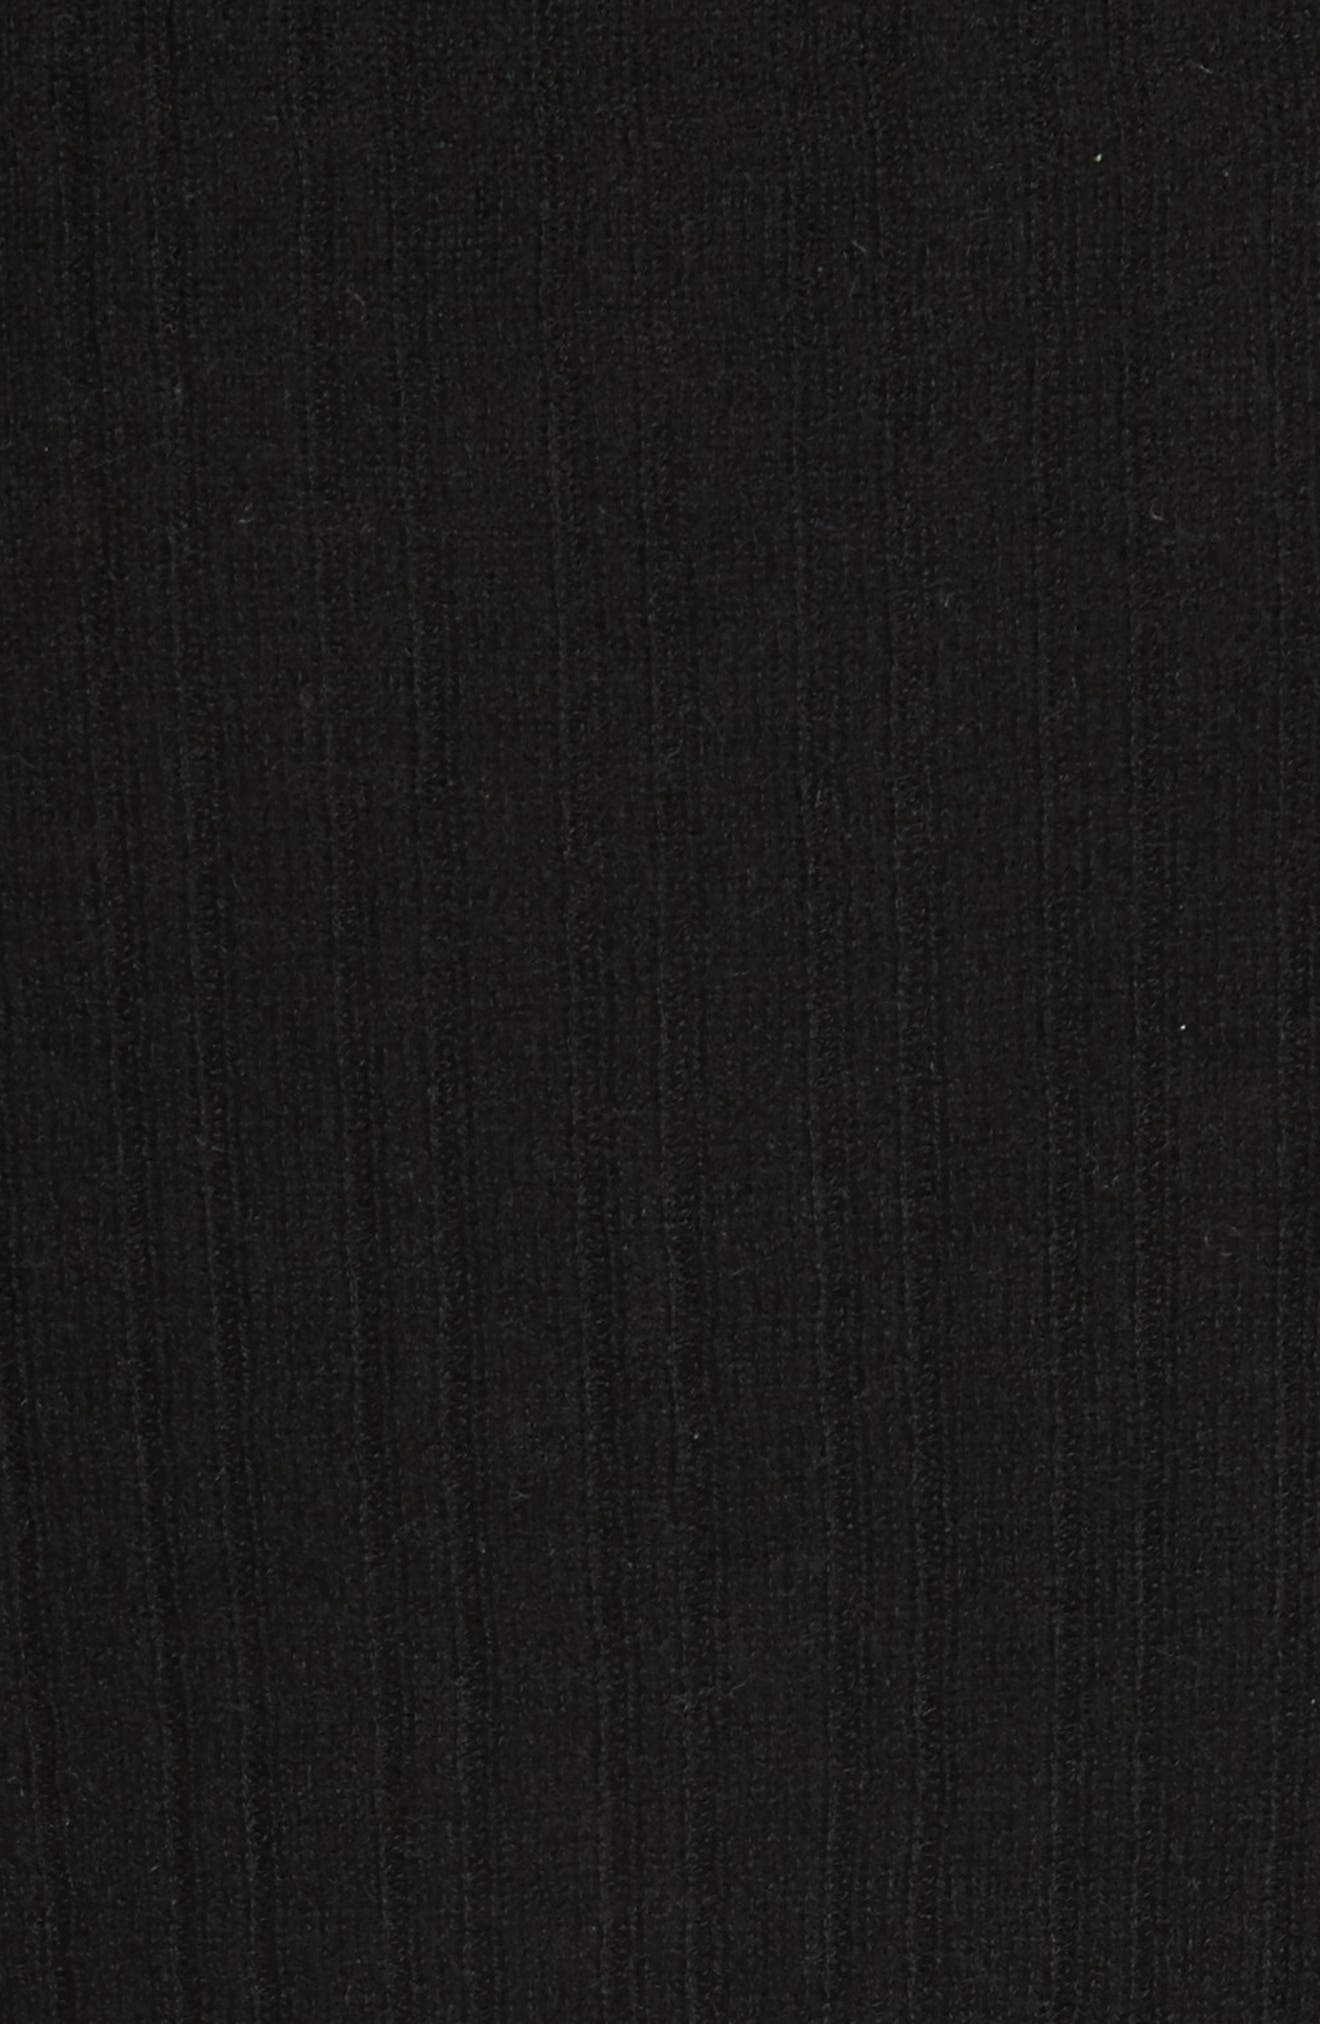 Ribbed Cashmere V-Neck Sweater,                             Alternate thumbnail 13, color,